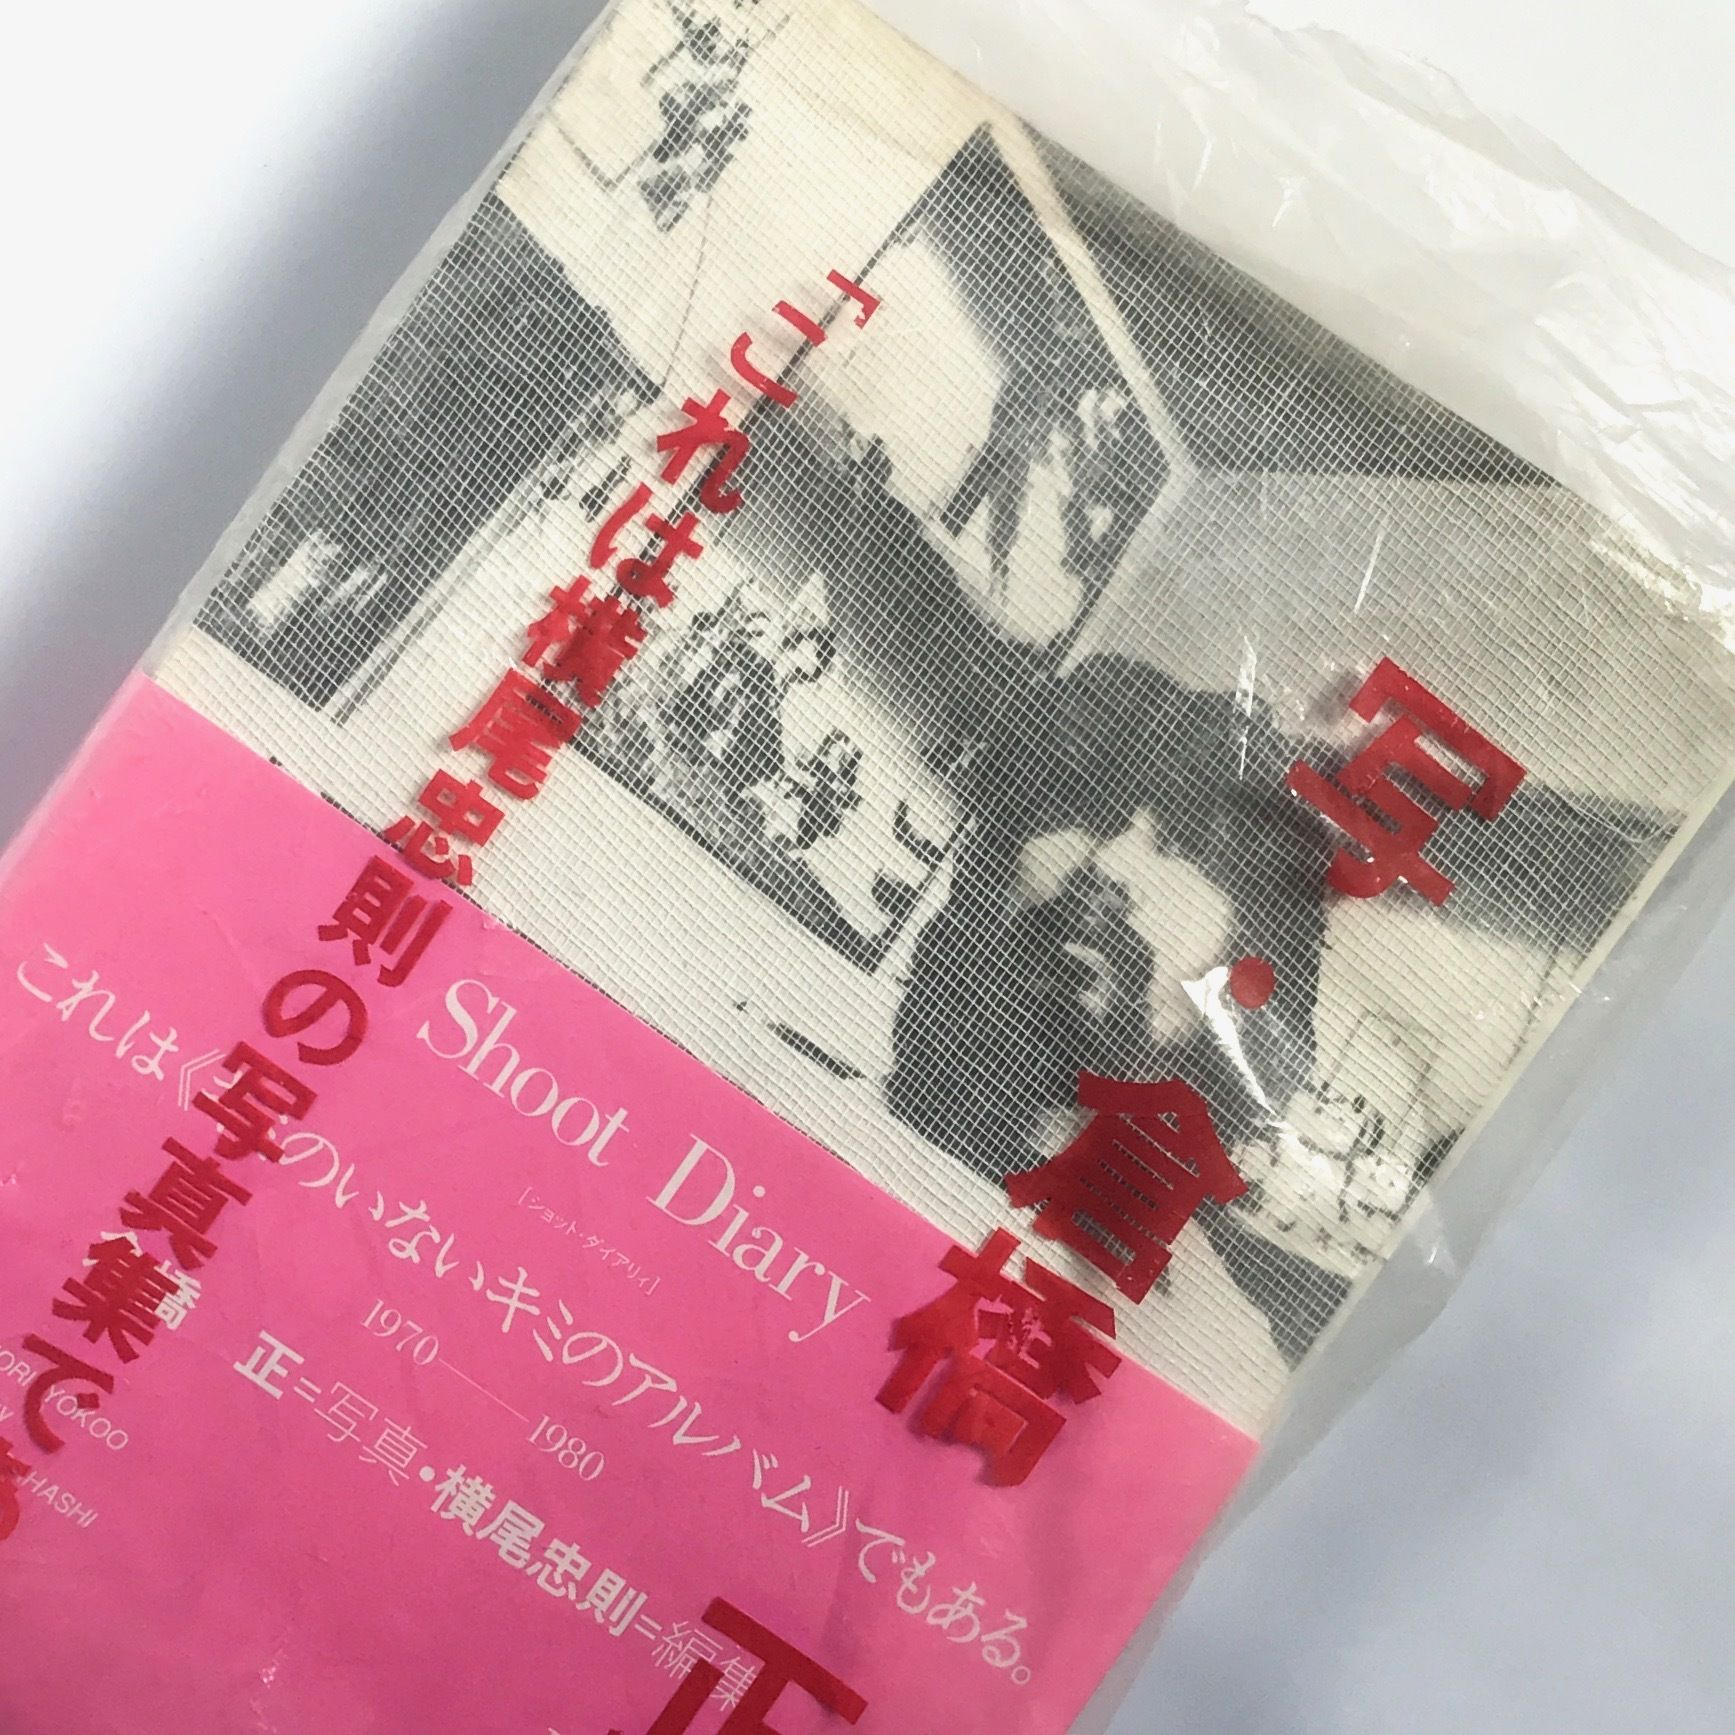 Title/ Shoot Diary Author/ 横尾忠則 倉橋正